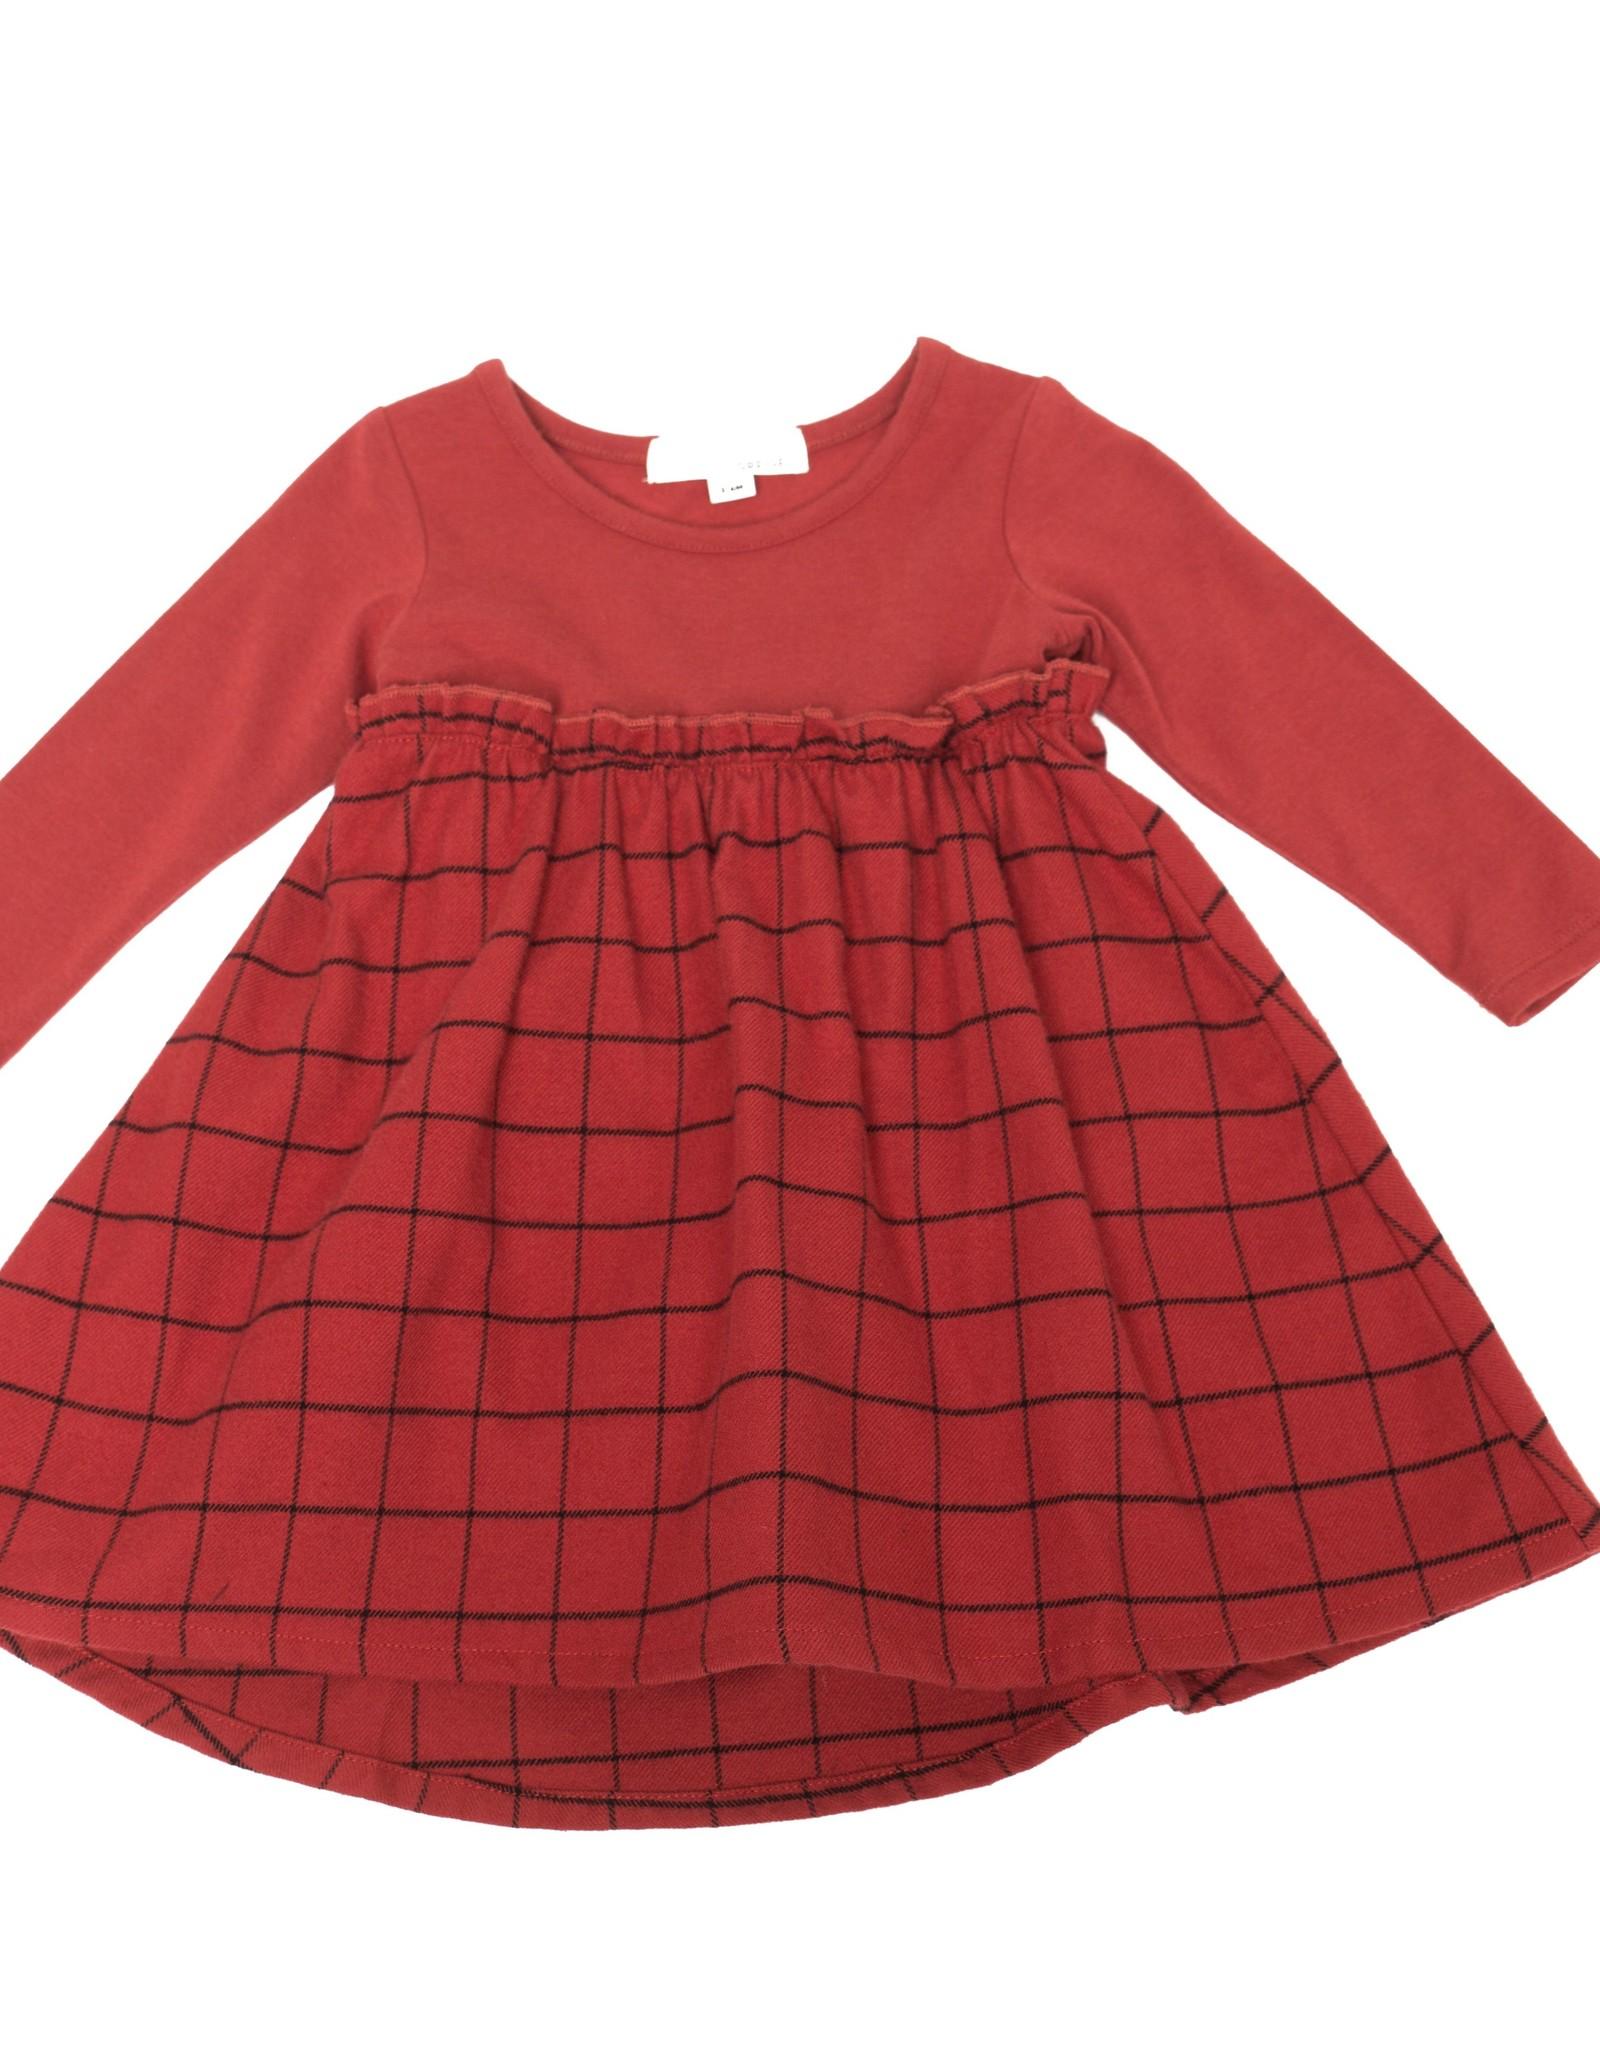 Greige Greige FA20 Long Sleeve Remix Dress- Maple Red